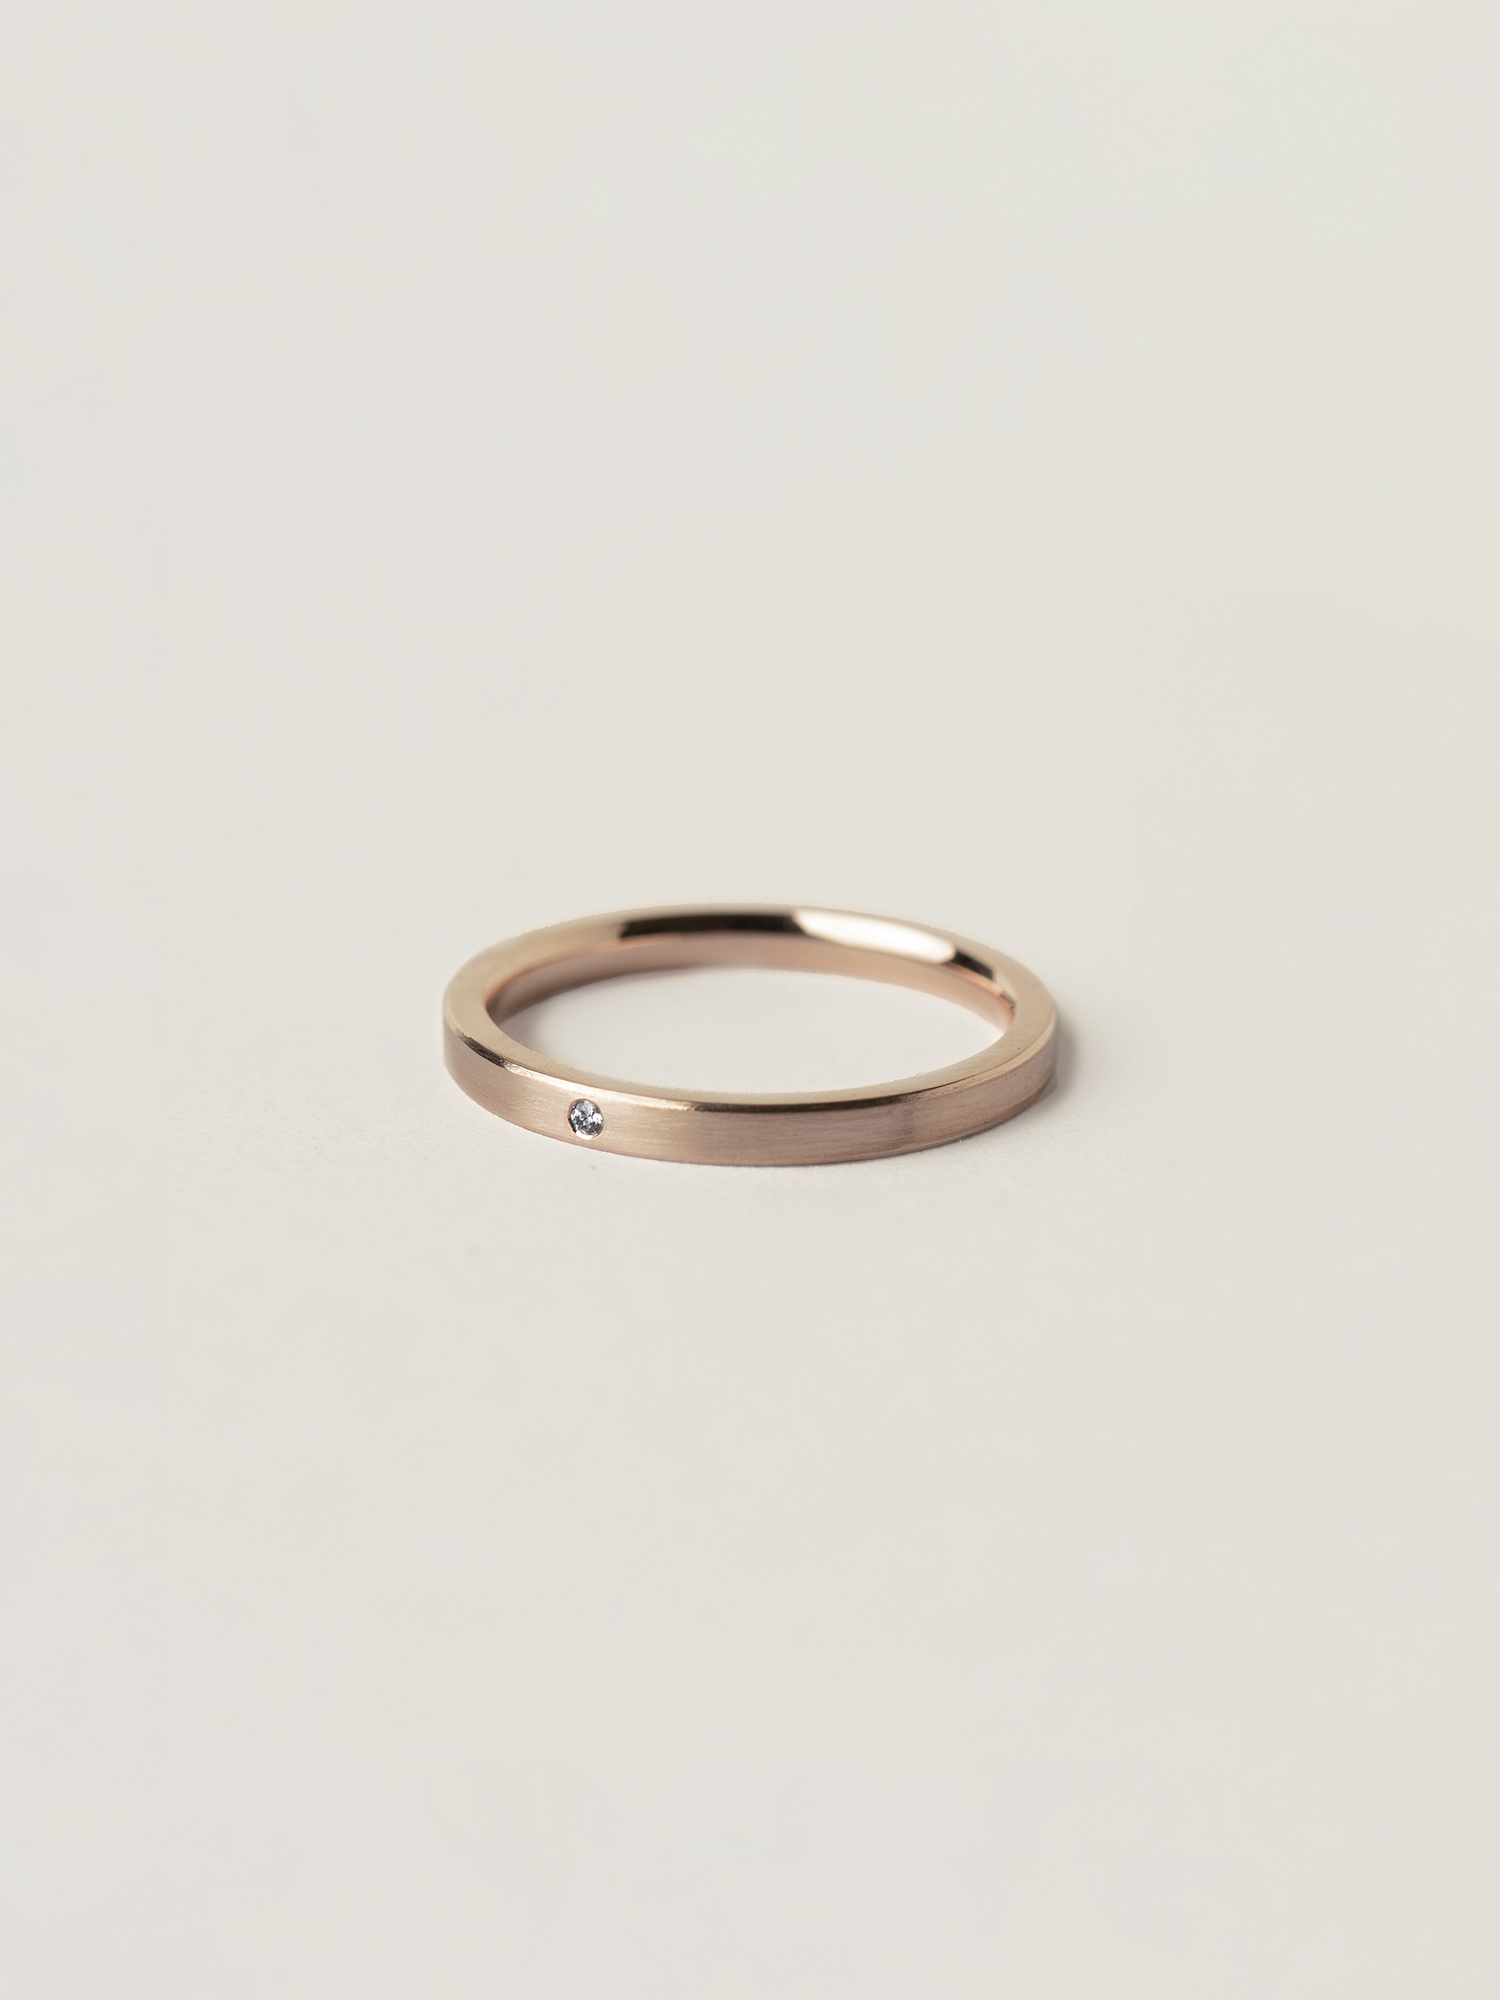 Verlobungsring-Rosegold-Diamant-Christina-Pauls2.jpg